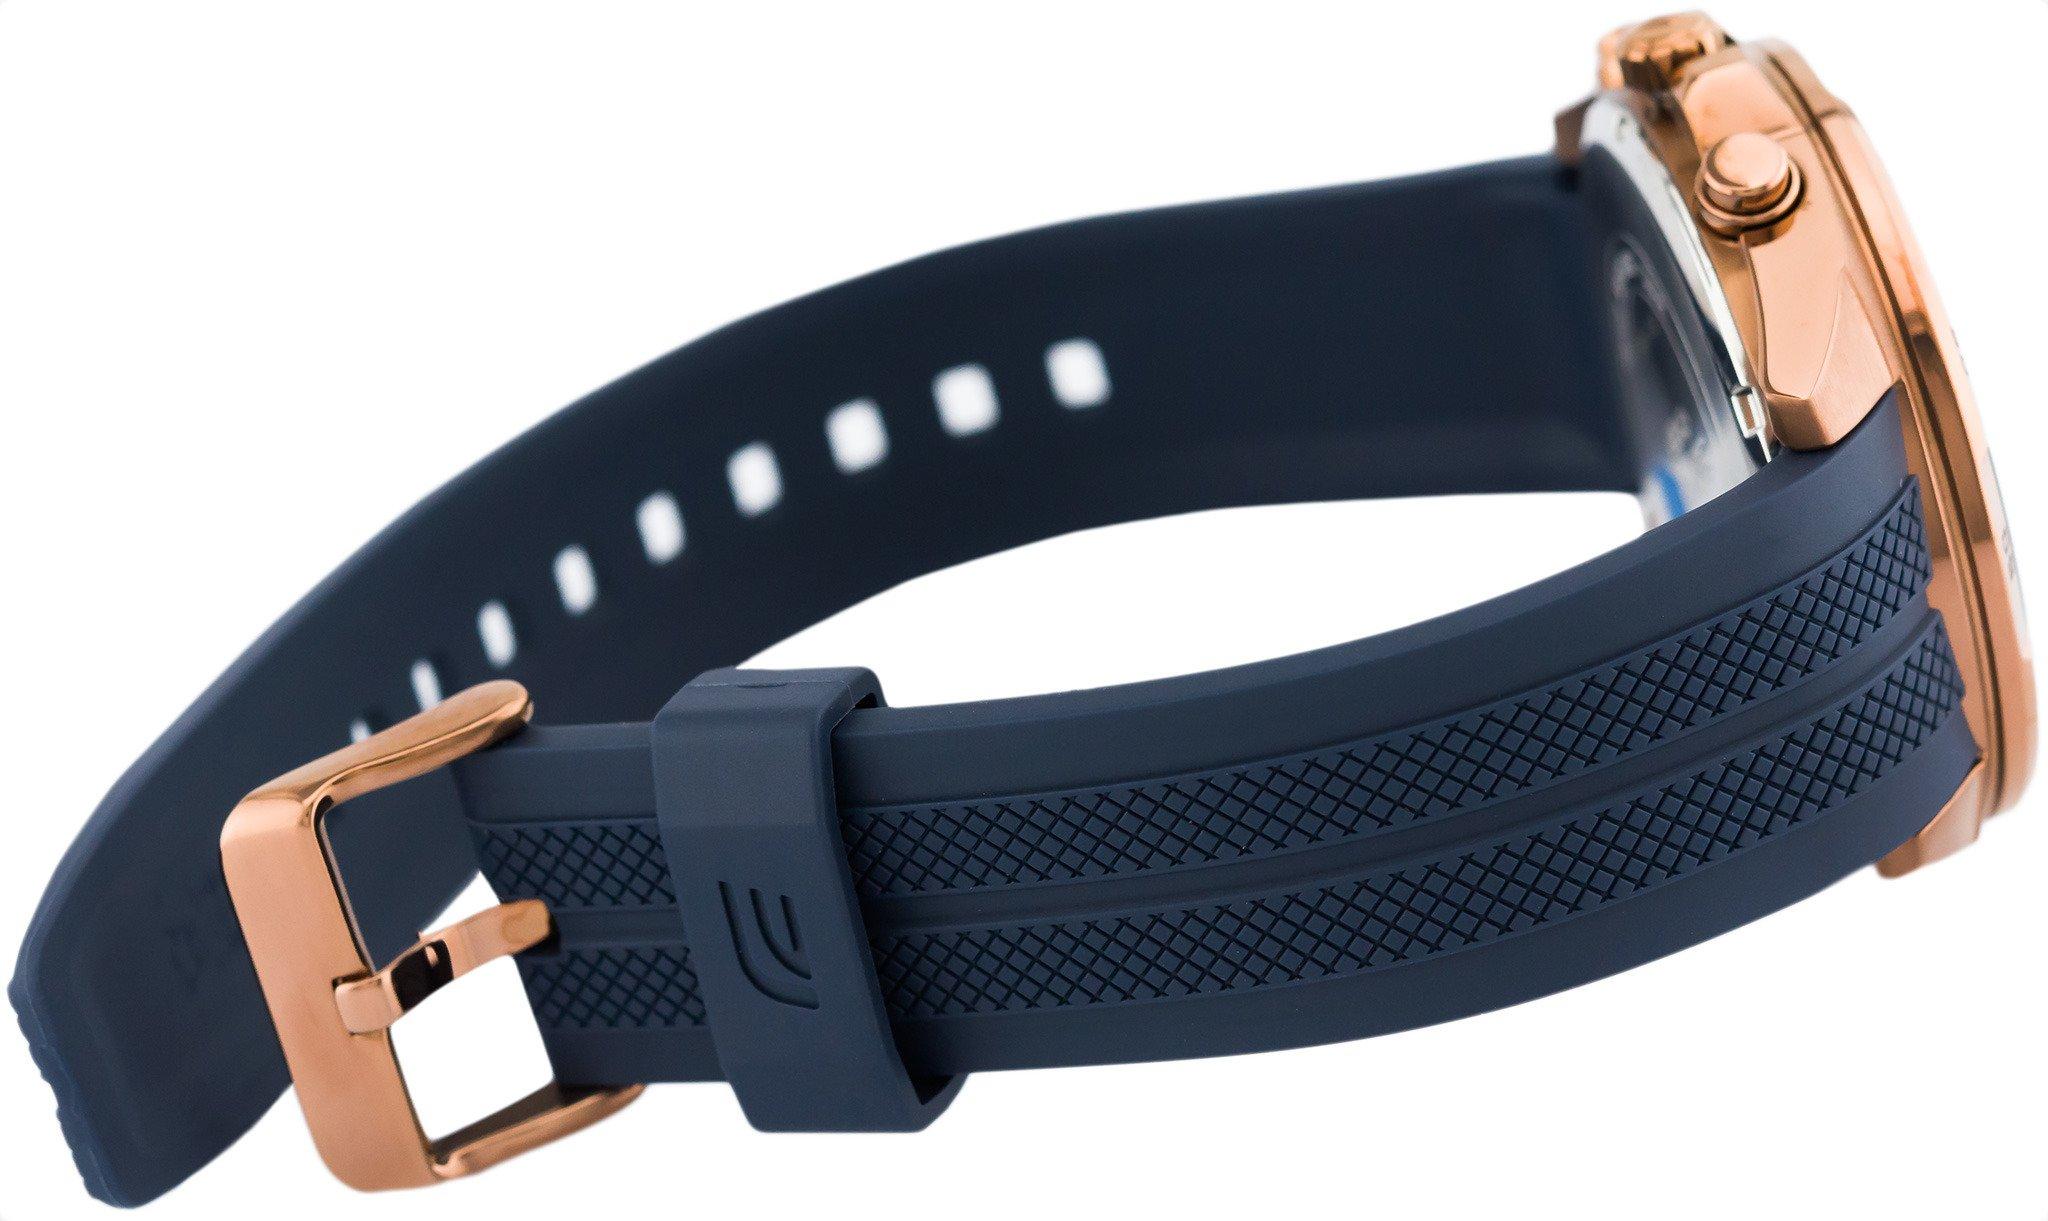 Zegarek męski CASIO EFR 556PC 2AV 422,00 zł cena tanio